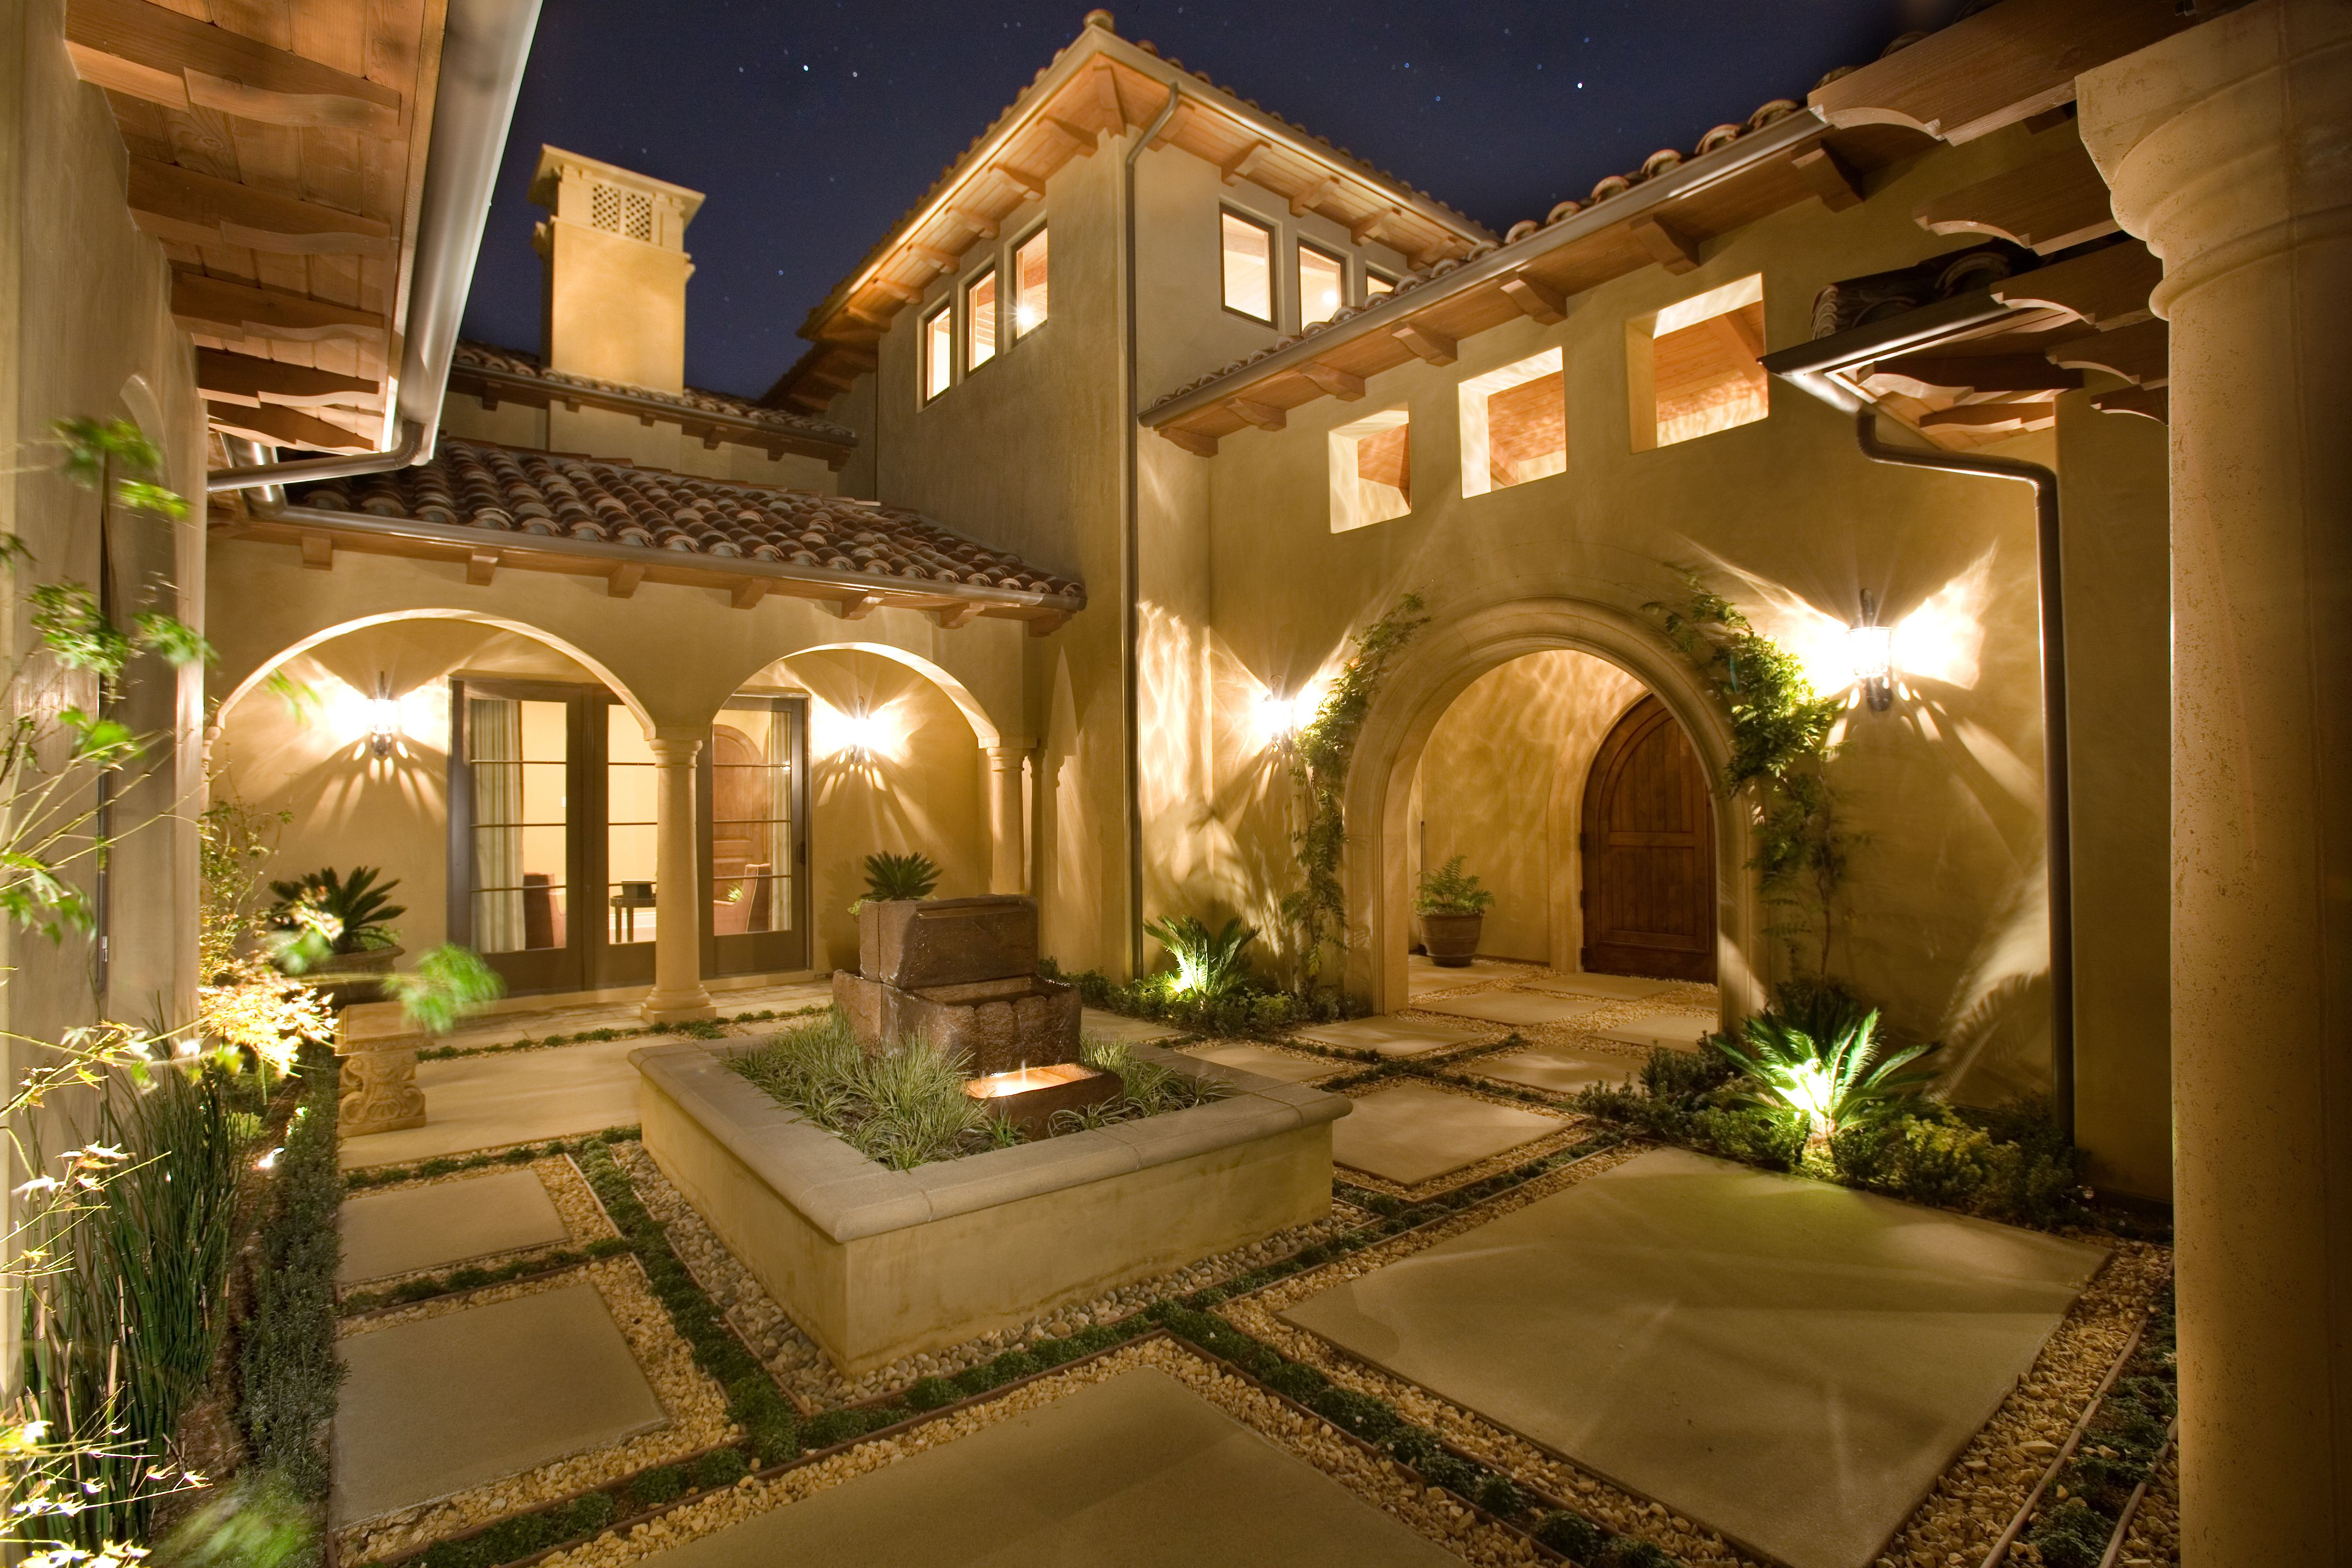 Montecito Charm - ARC Design Group